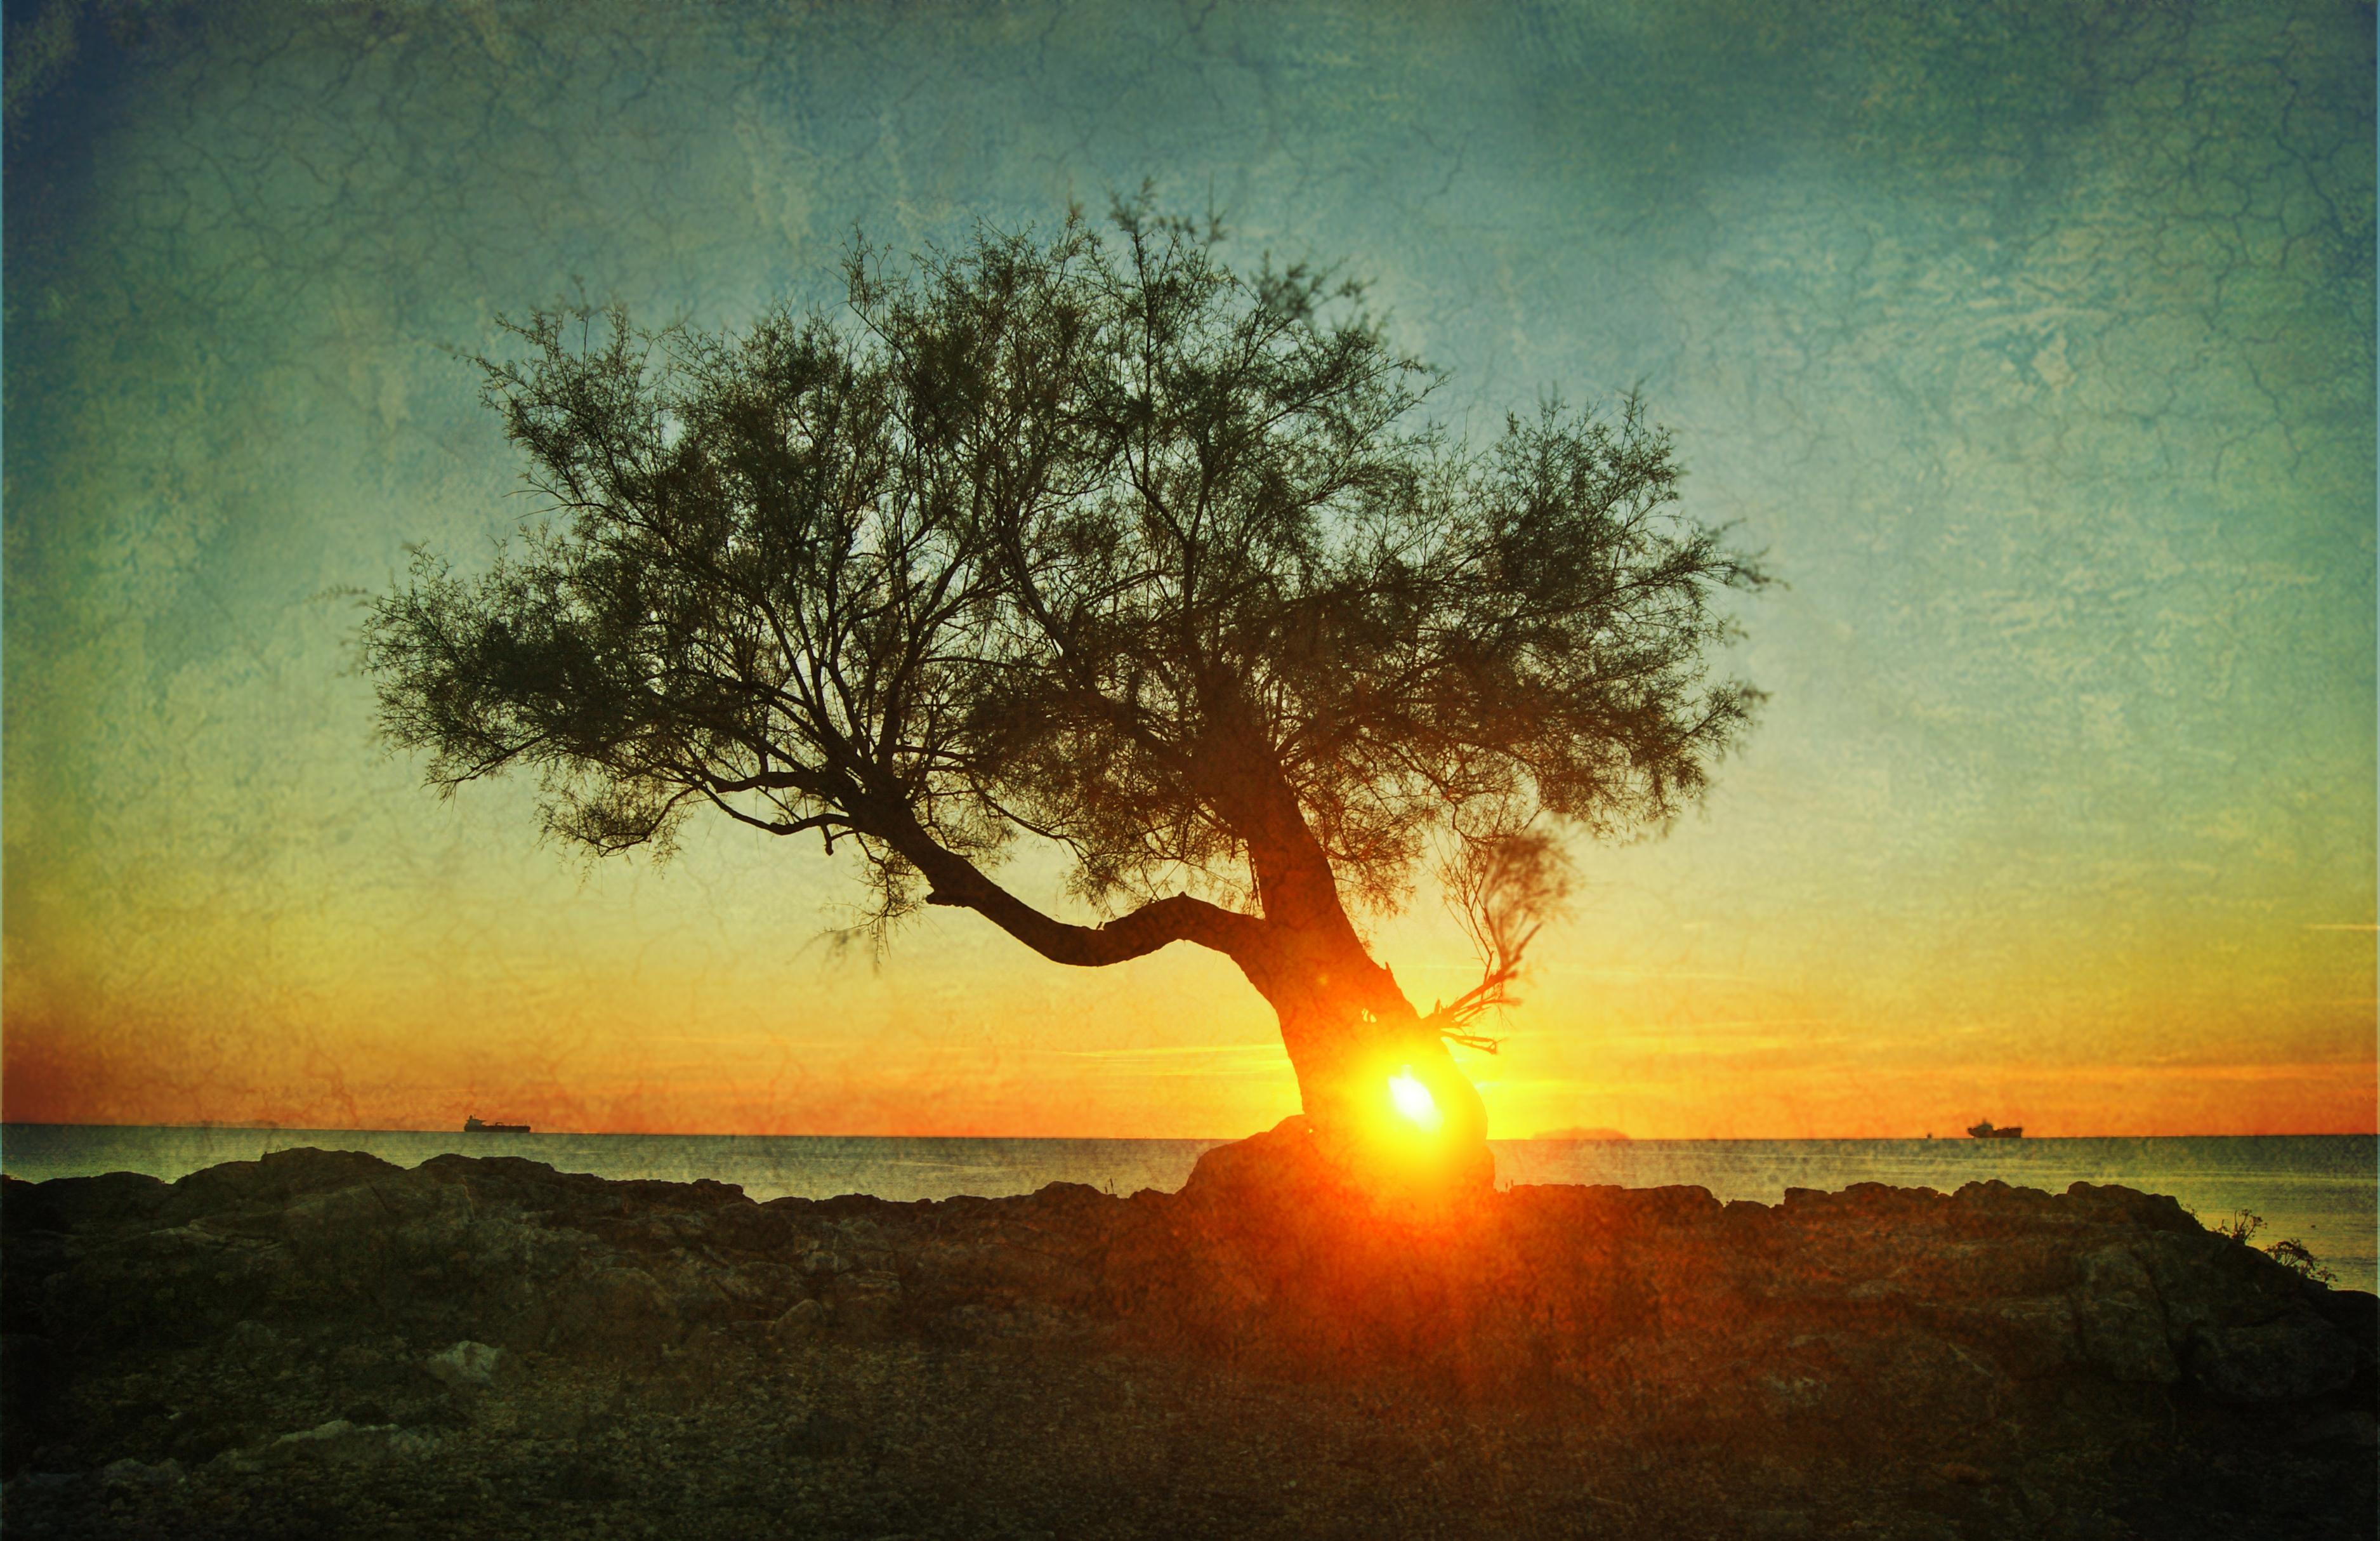 Fondos de paisajes naturaleza en alta resolucion fondo for Fondos de pantalla alta resolucion